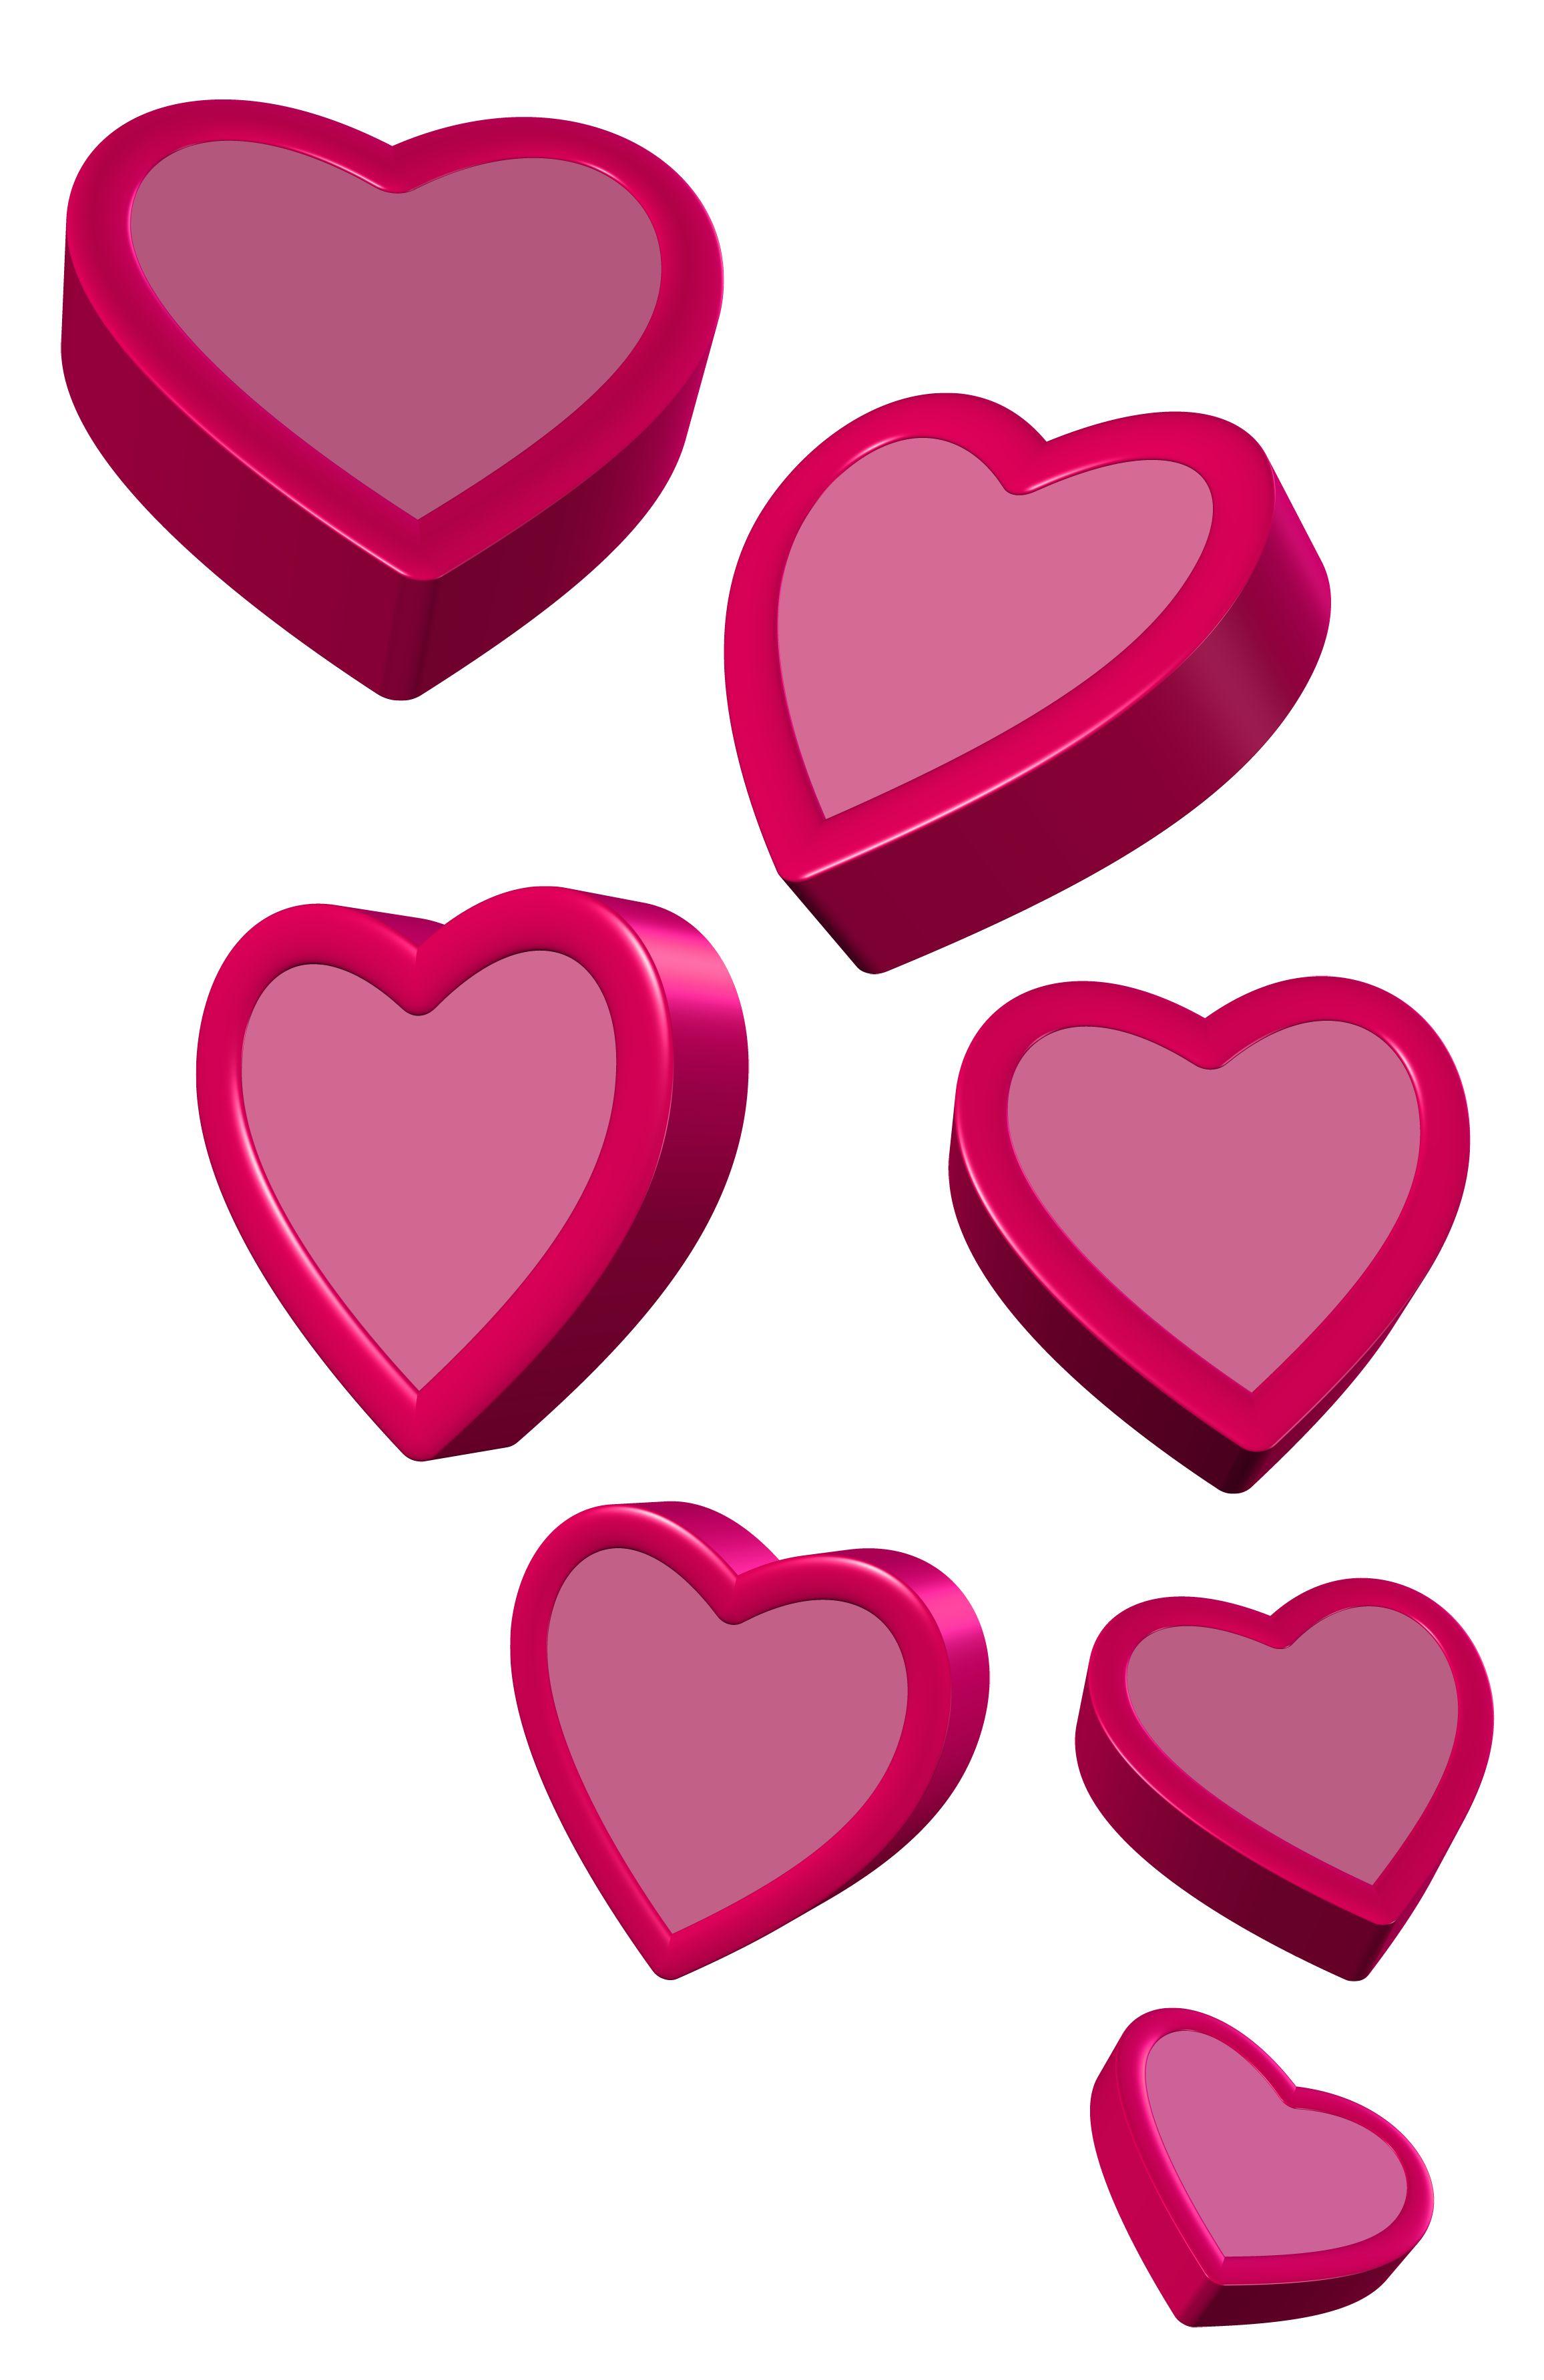 hight resolution of heart clip art image from http gallery yopriceville com var albums